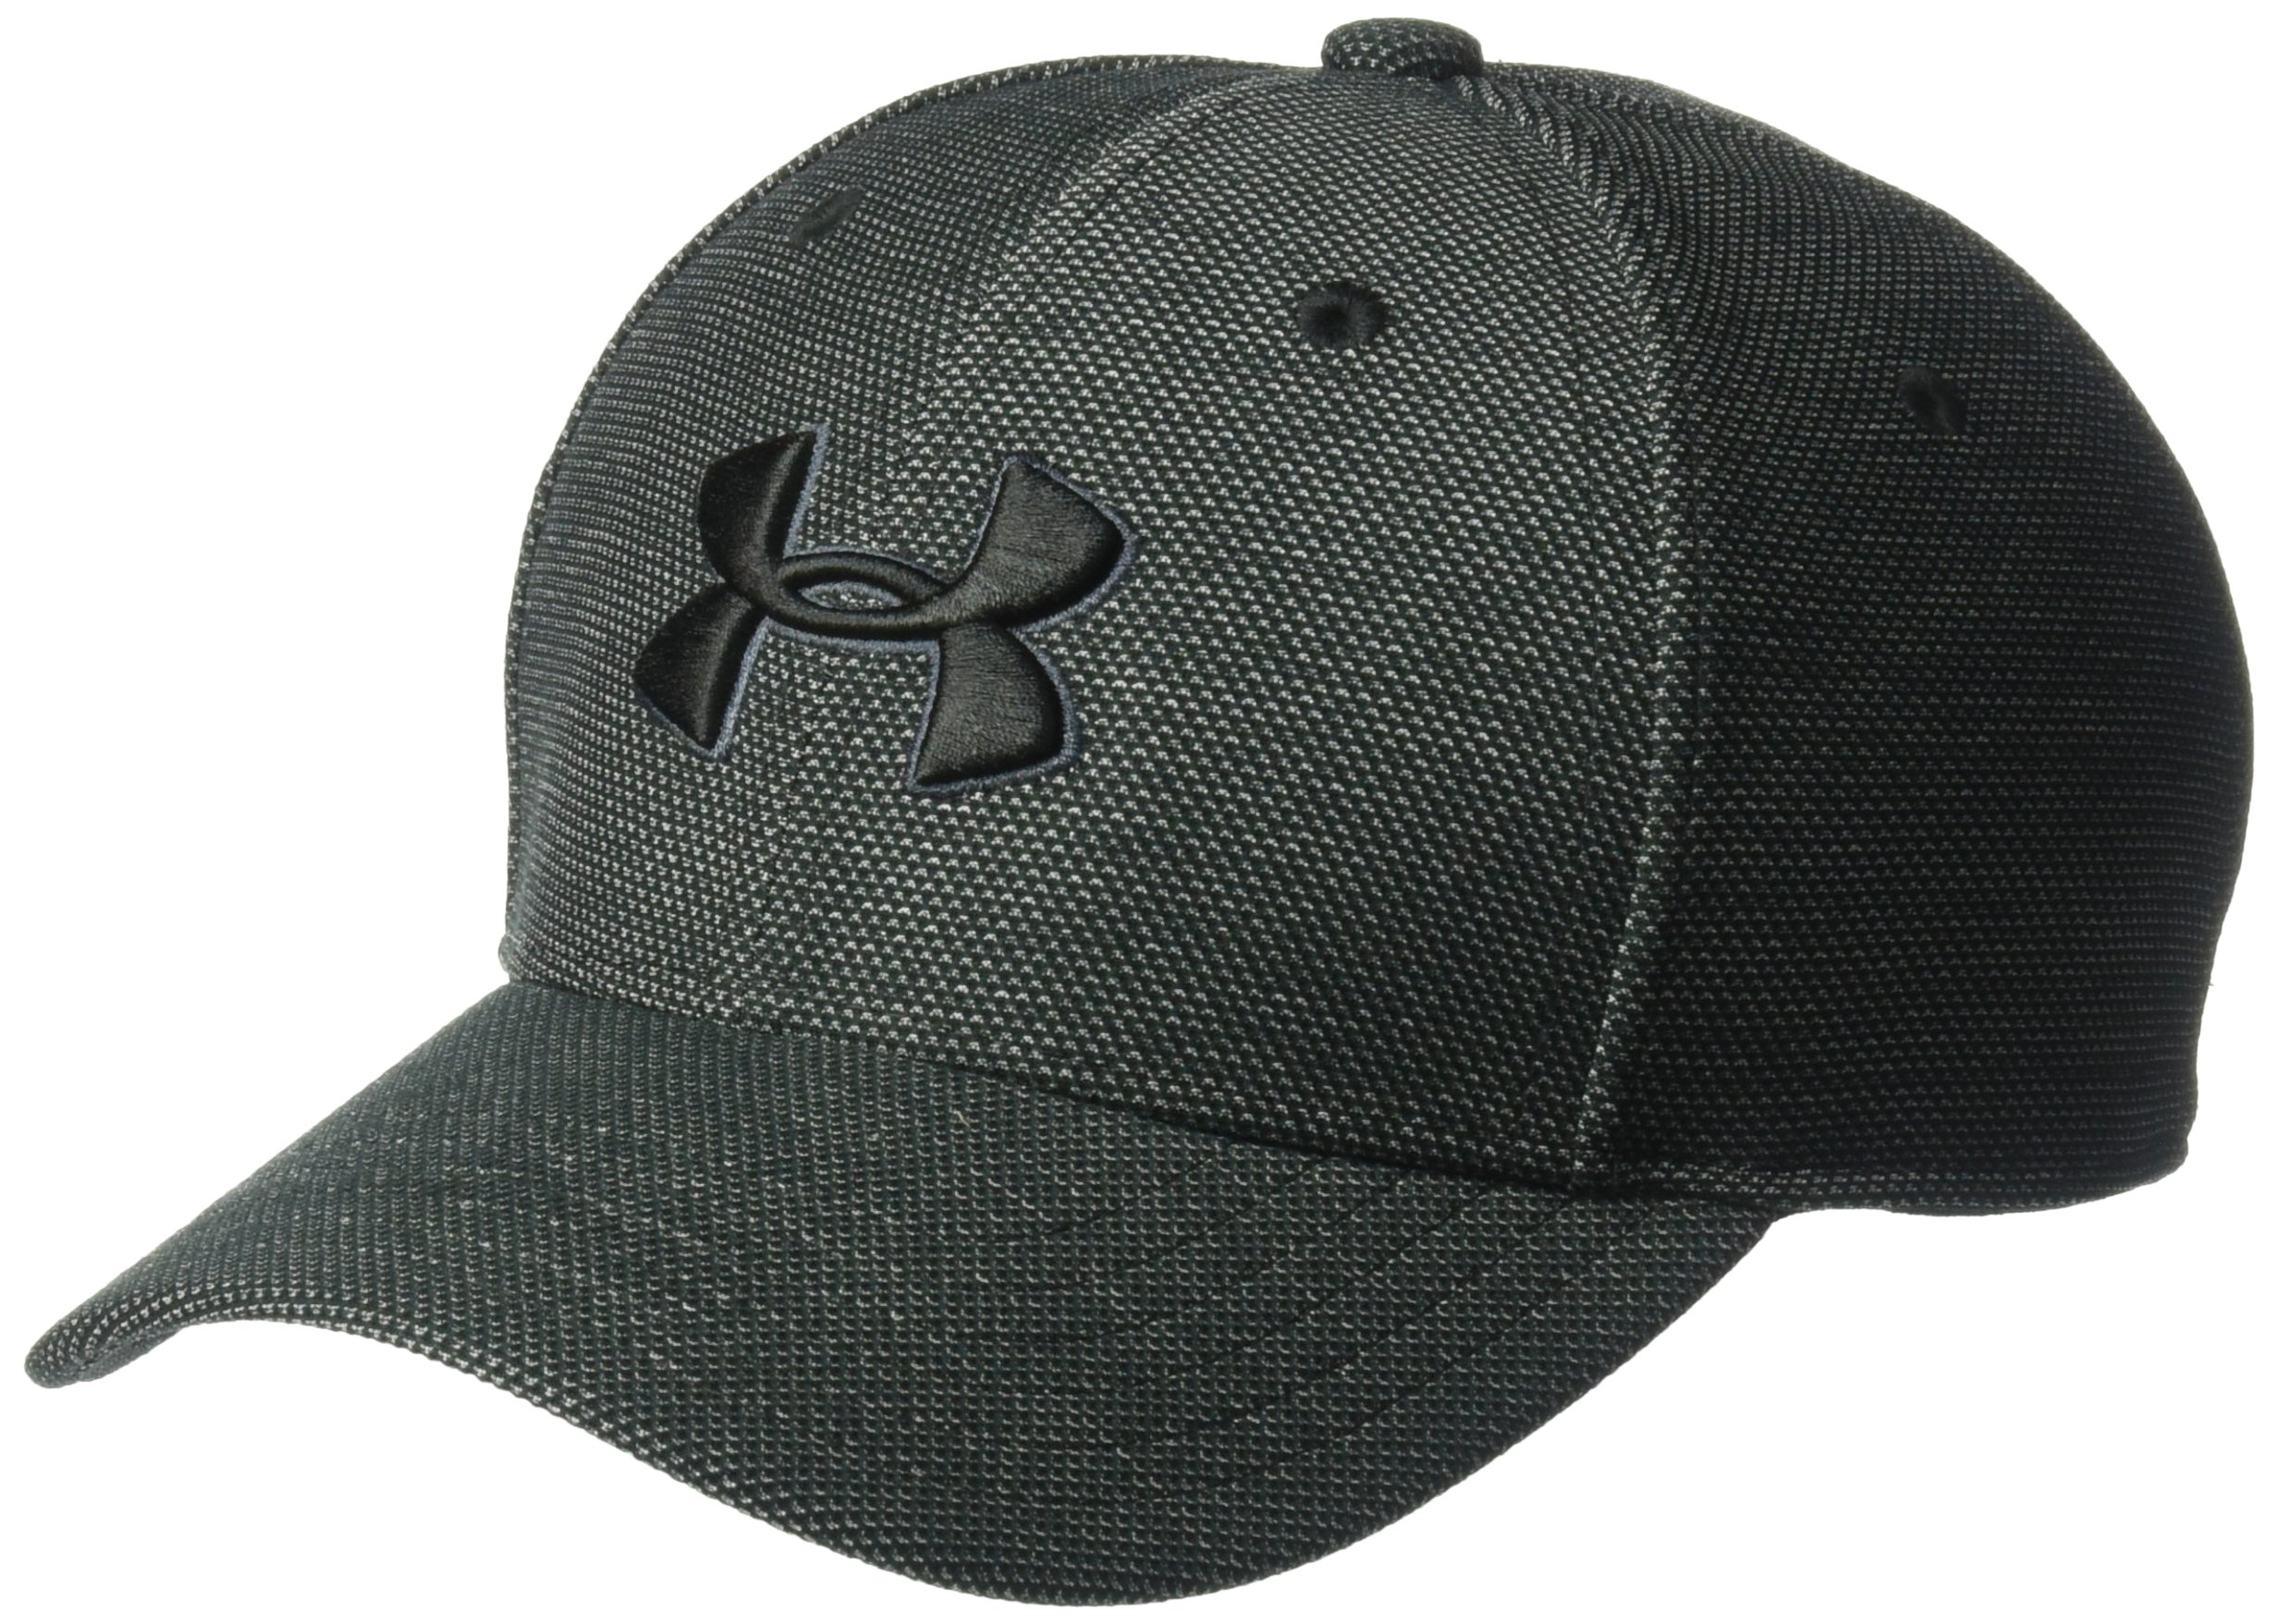 Under Armour Boys' Heathered Blitzing 3.0 Cap, Black (001)/Black, Youth Small/Medium